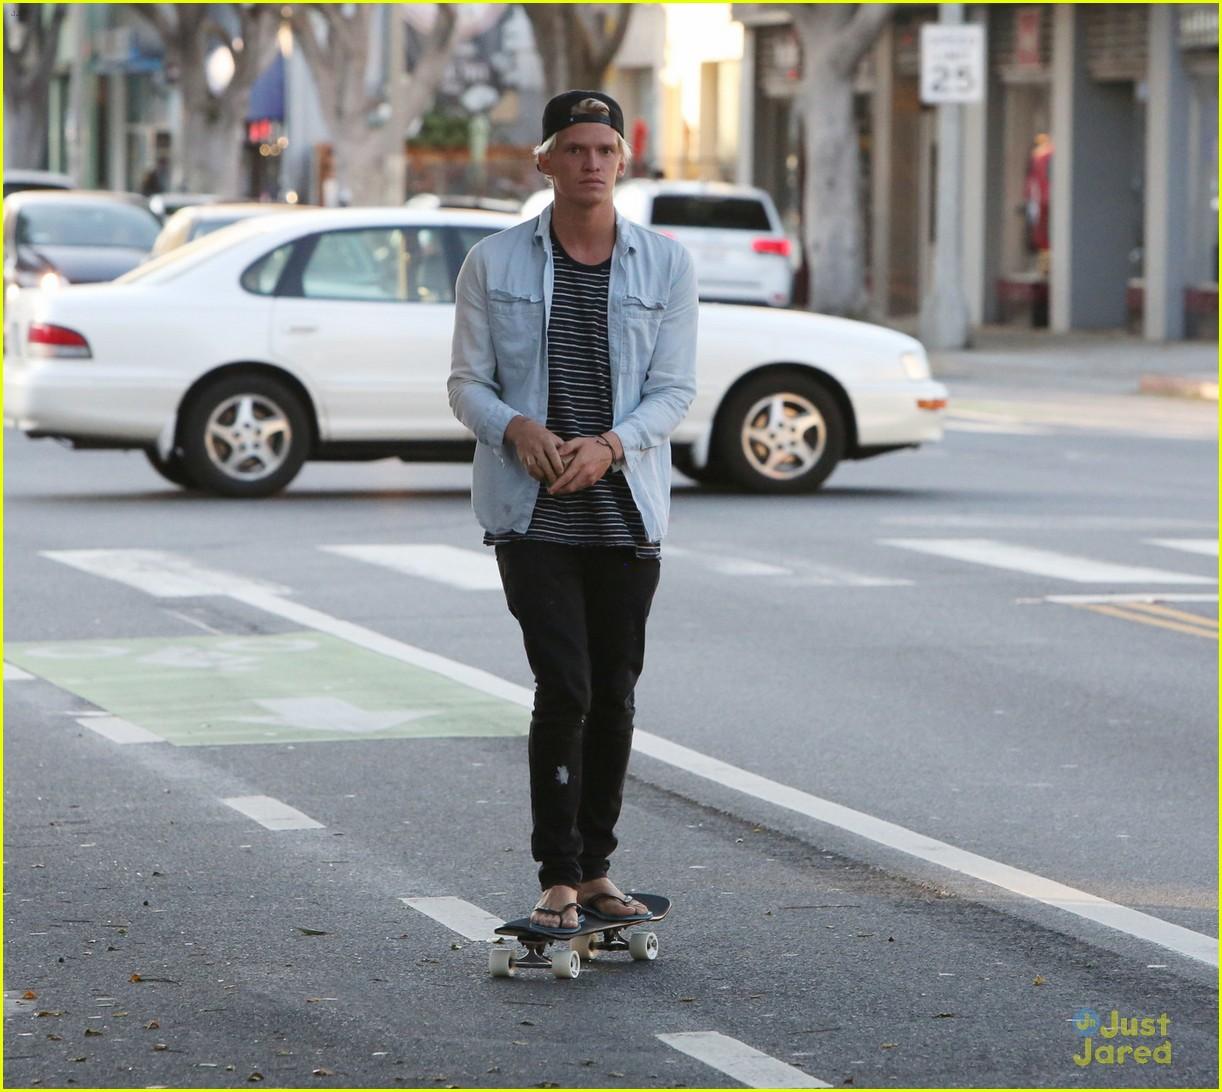 cody simpson skateboard alli 18th birthday 02